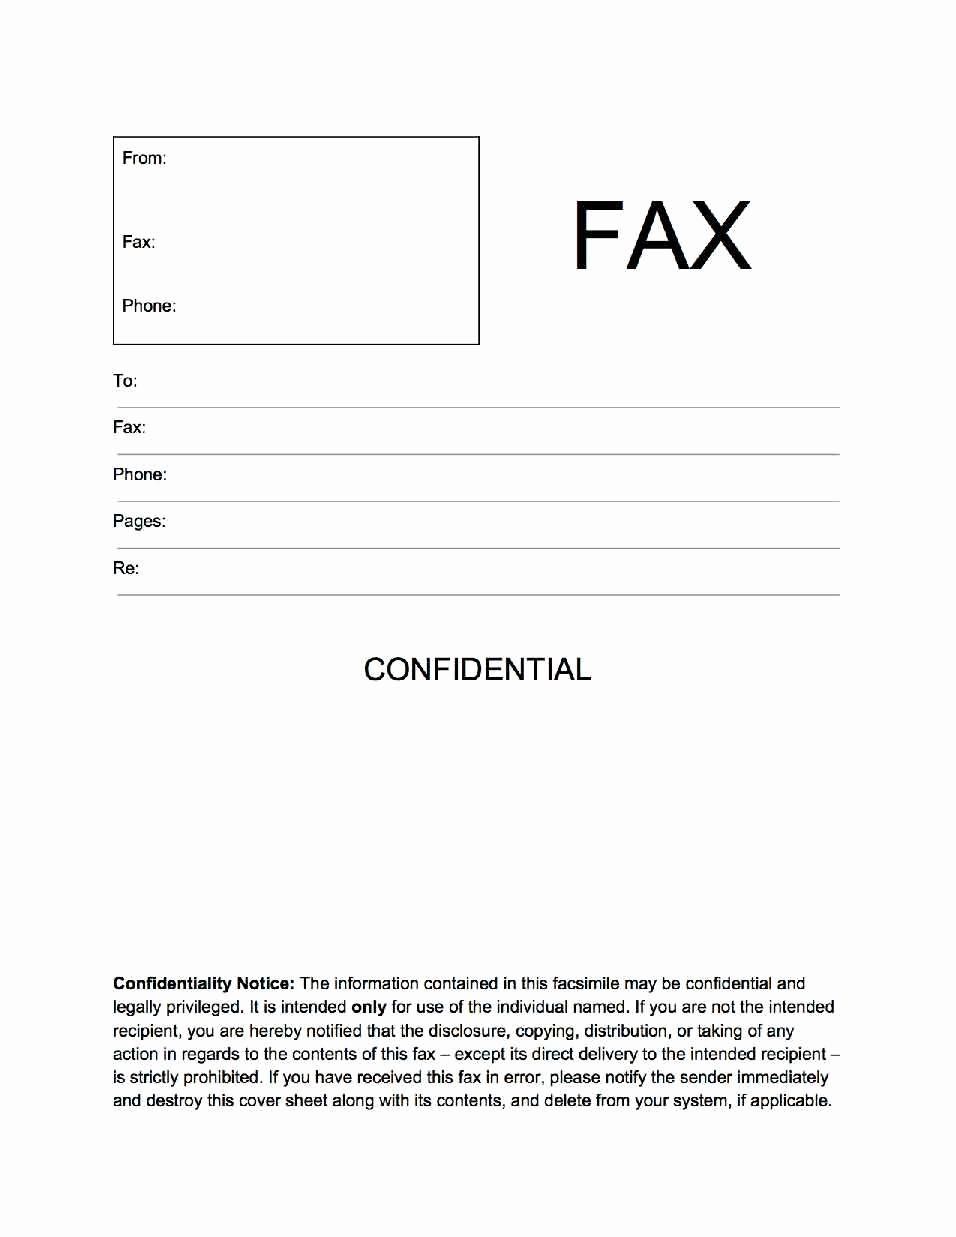 Printable Fax Cover Sheet Confidential Inspirational Confidential Fax Cover Sheet